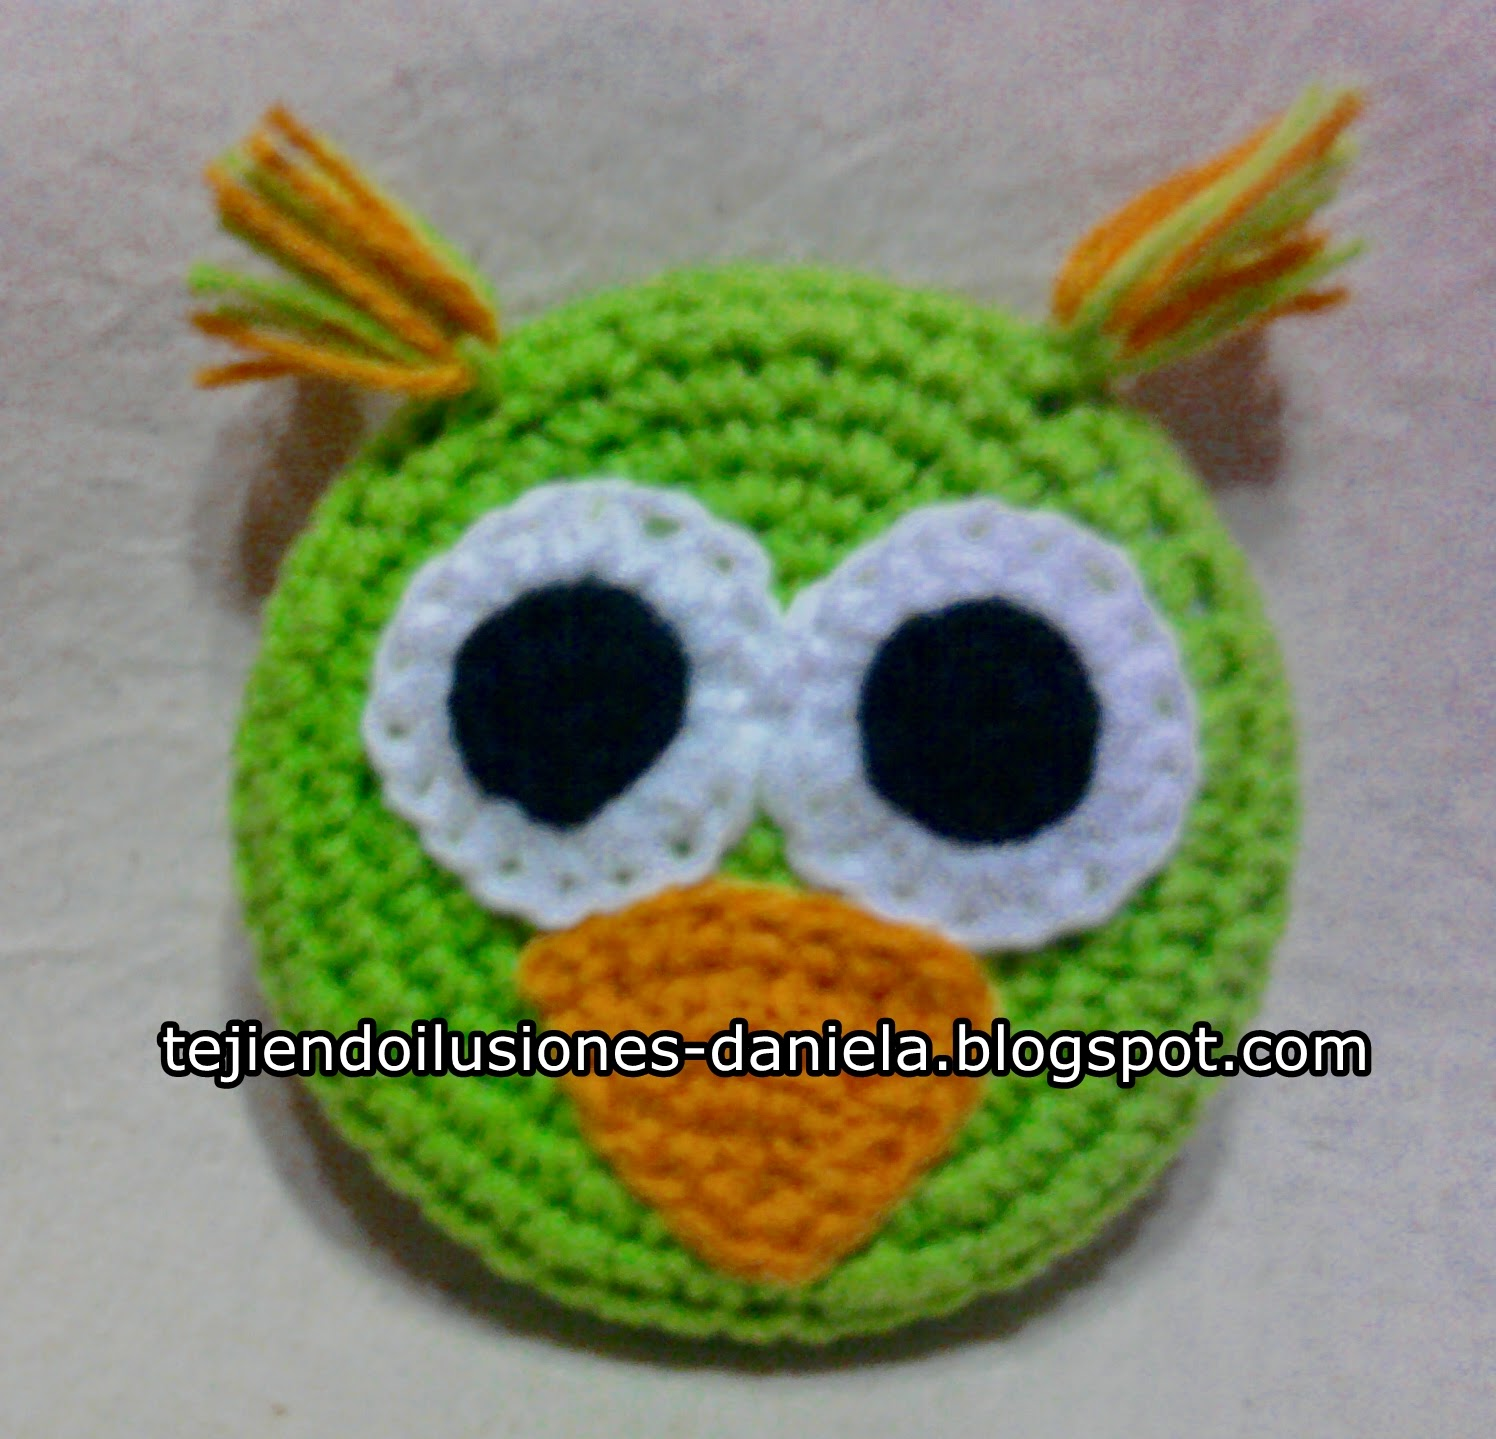 Tejido Y Artesanias A Crochet | apexwallpapers.com